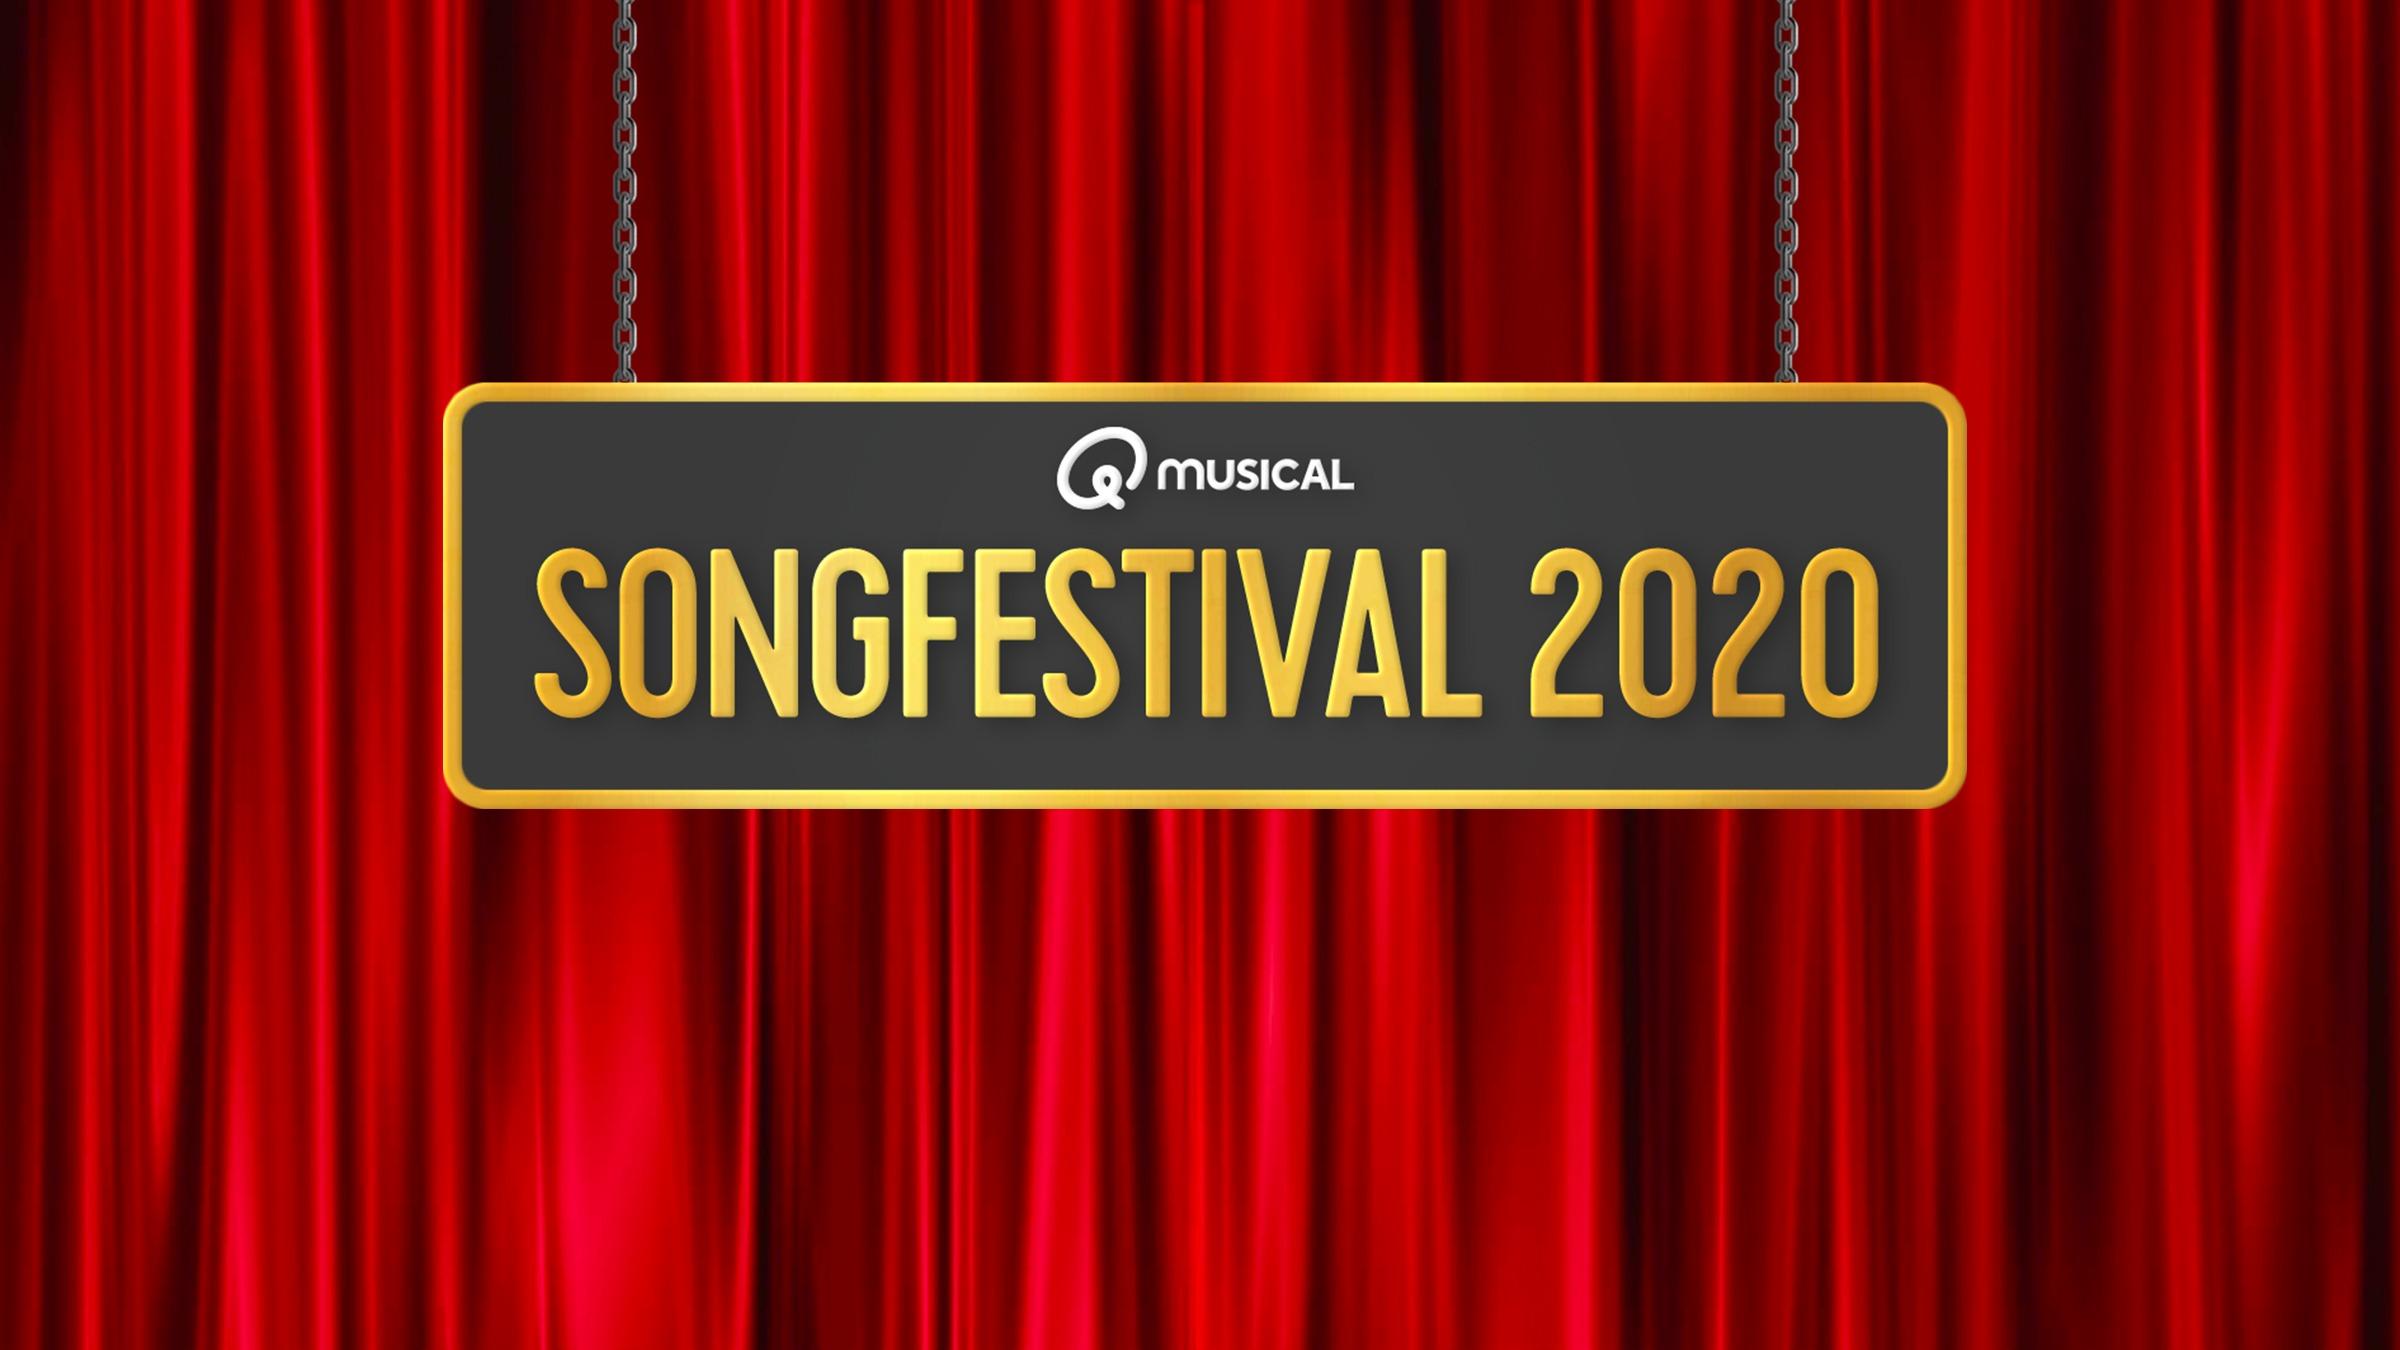 Songfestival 2020